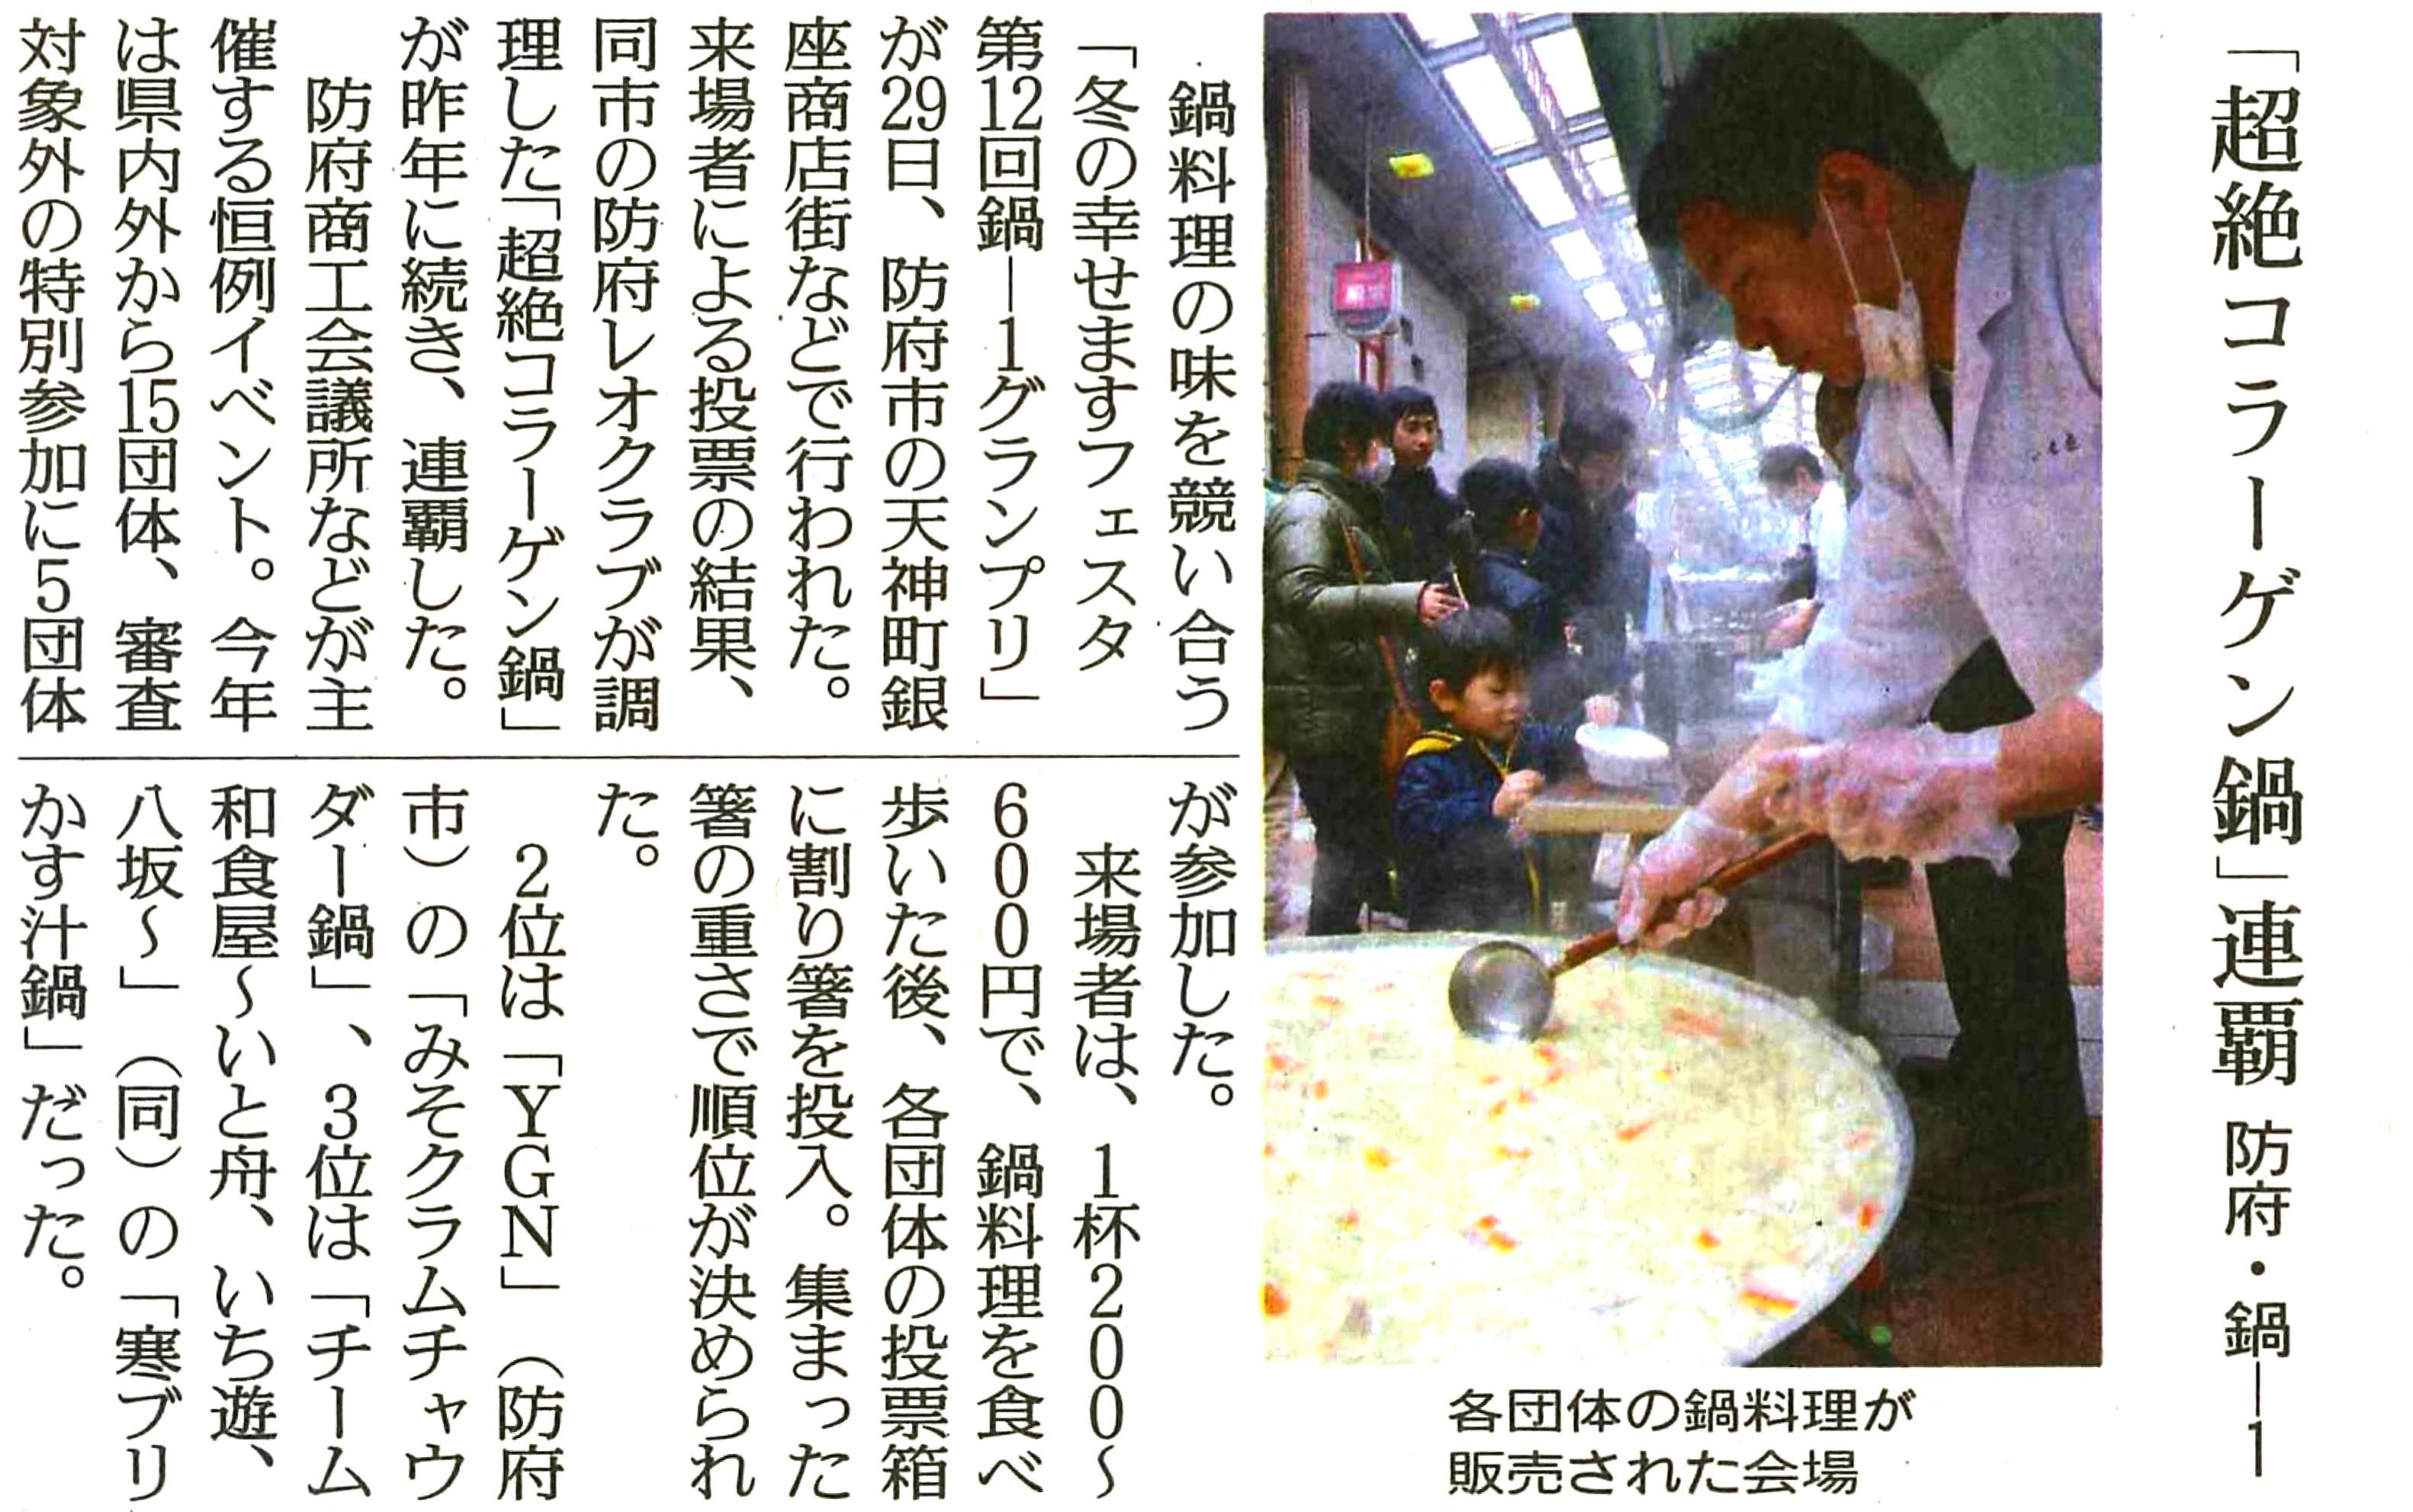 H29.1.30 読売新聞